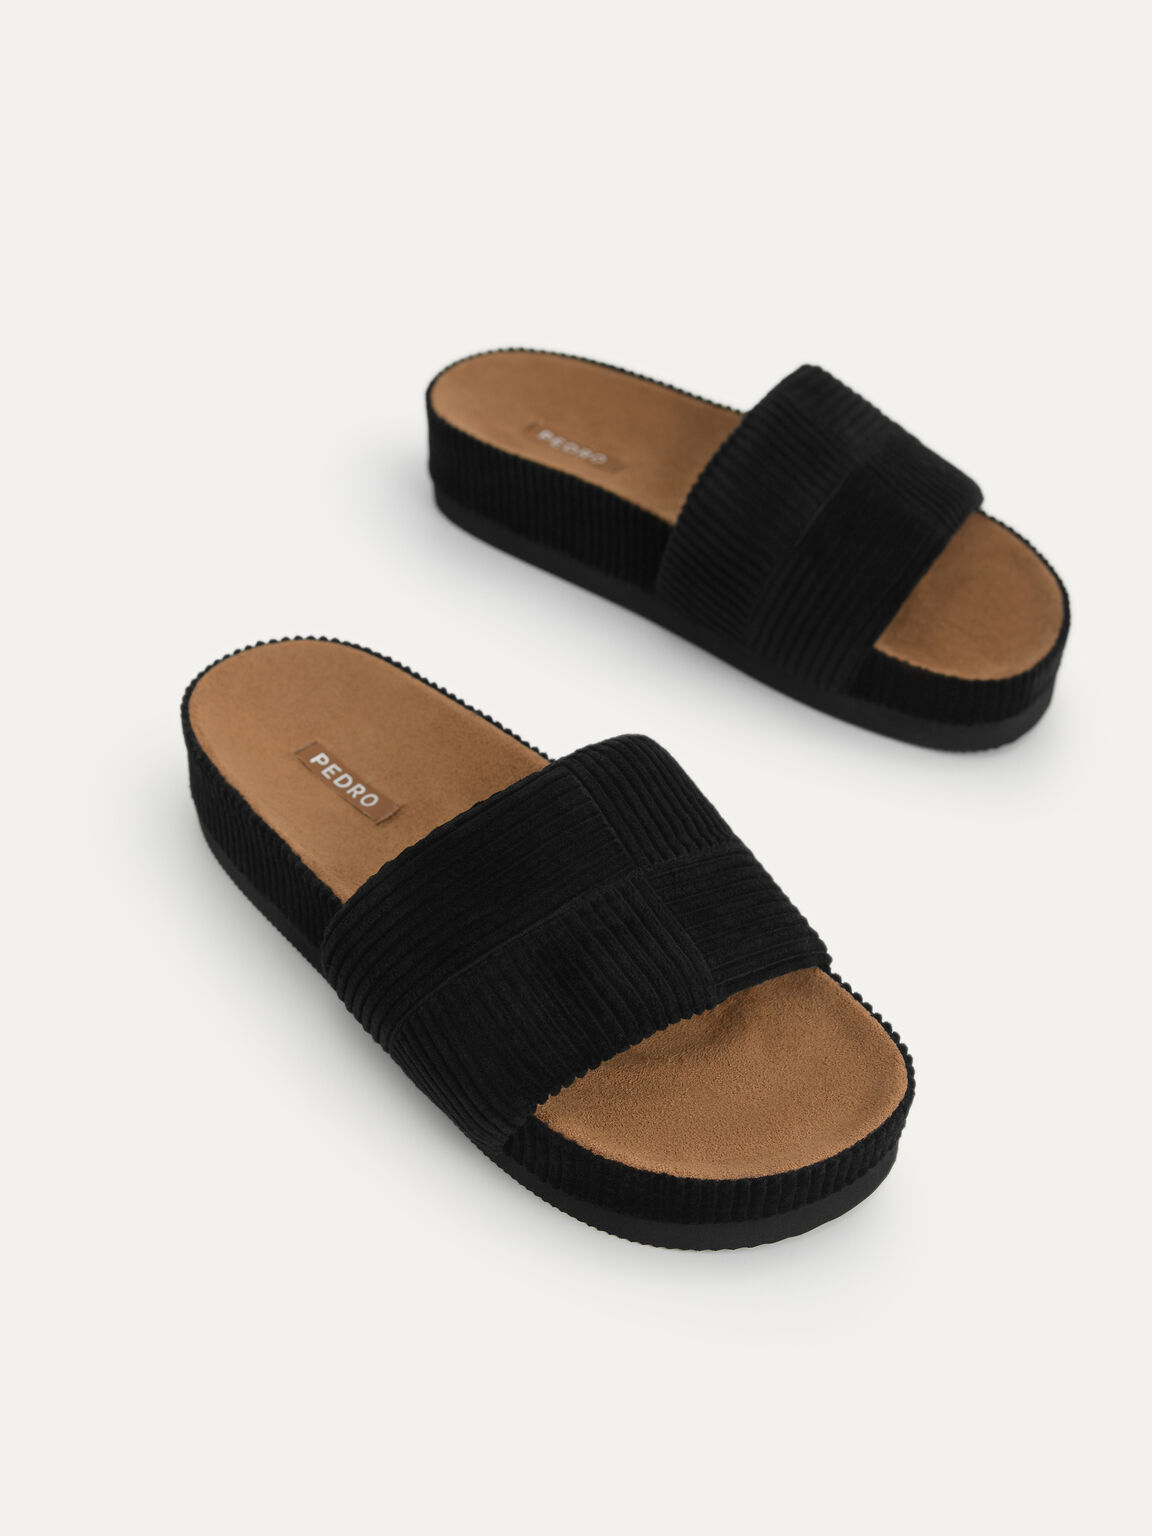 Corduroy Flatform Sandals, Black, hi-res